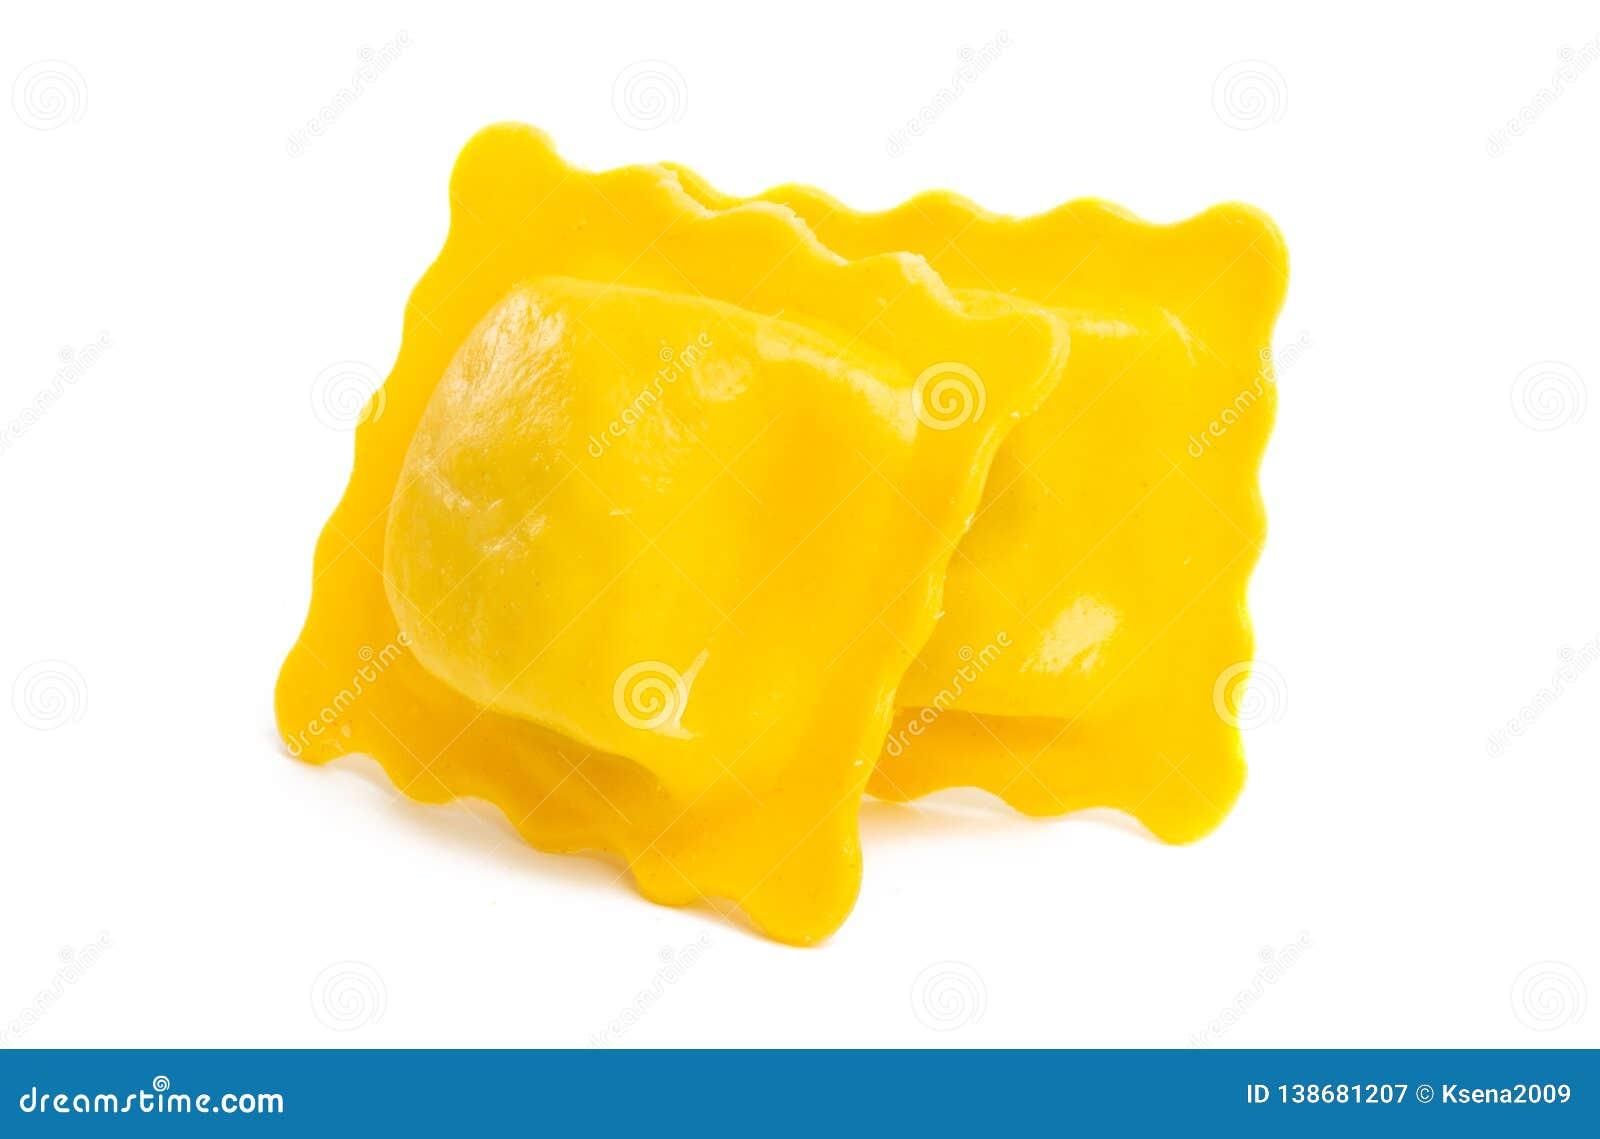 square ravioli isolated